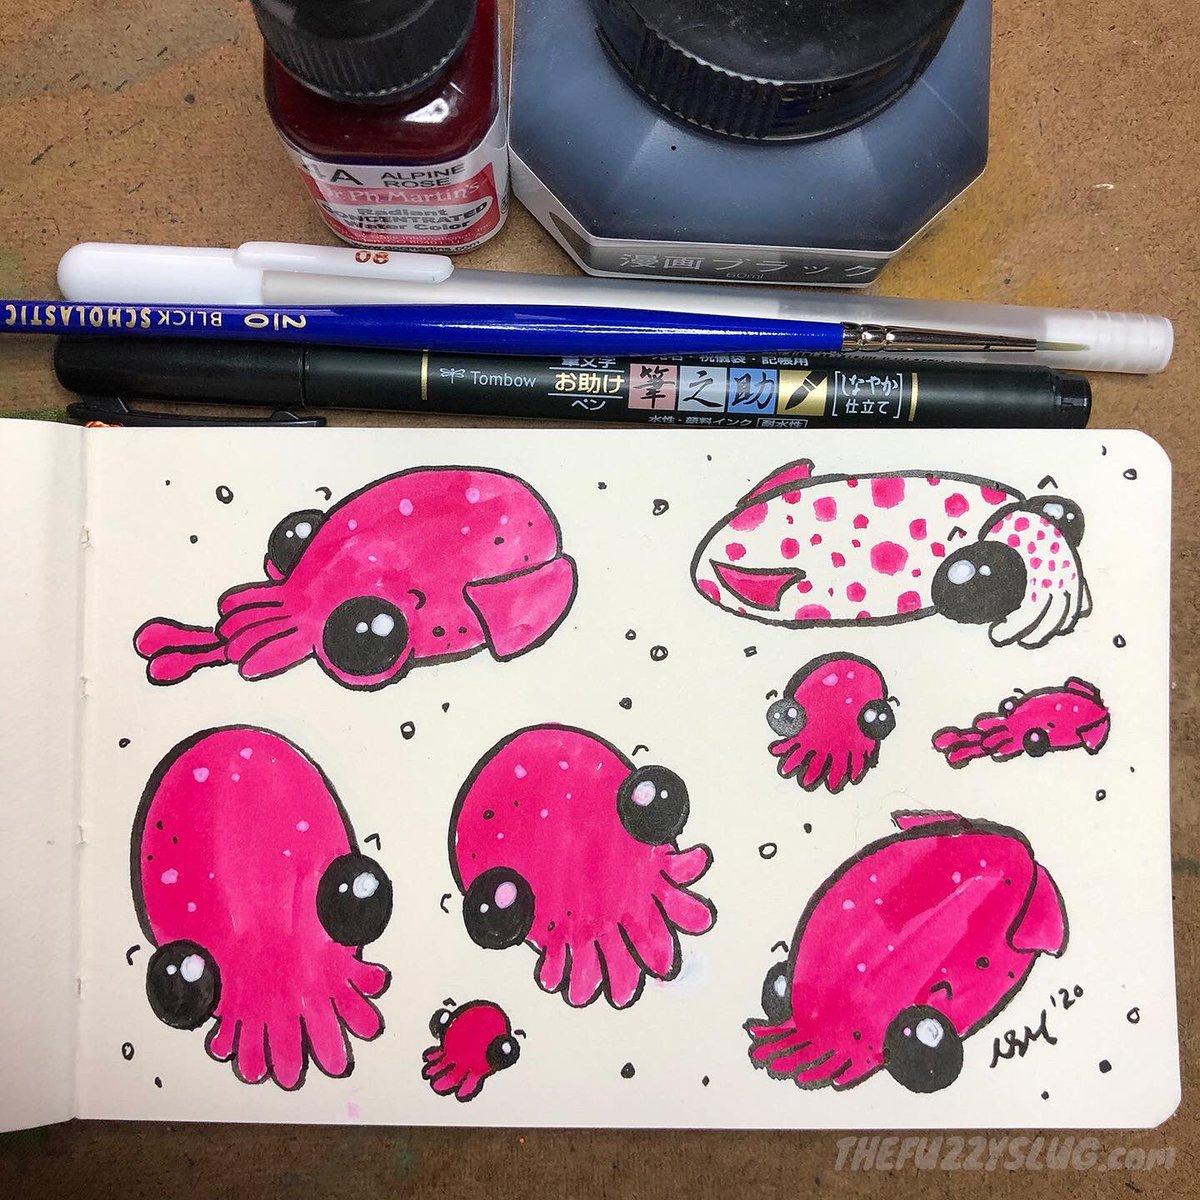 Cephalopod friends  . . . #NewSketchbook #DrPhMartins #watercolor #cephalopod #CephalopodArtpic.twitter.com/CUS6Bkgpq7